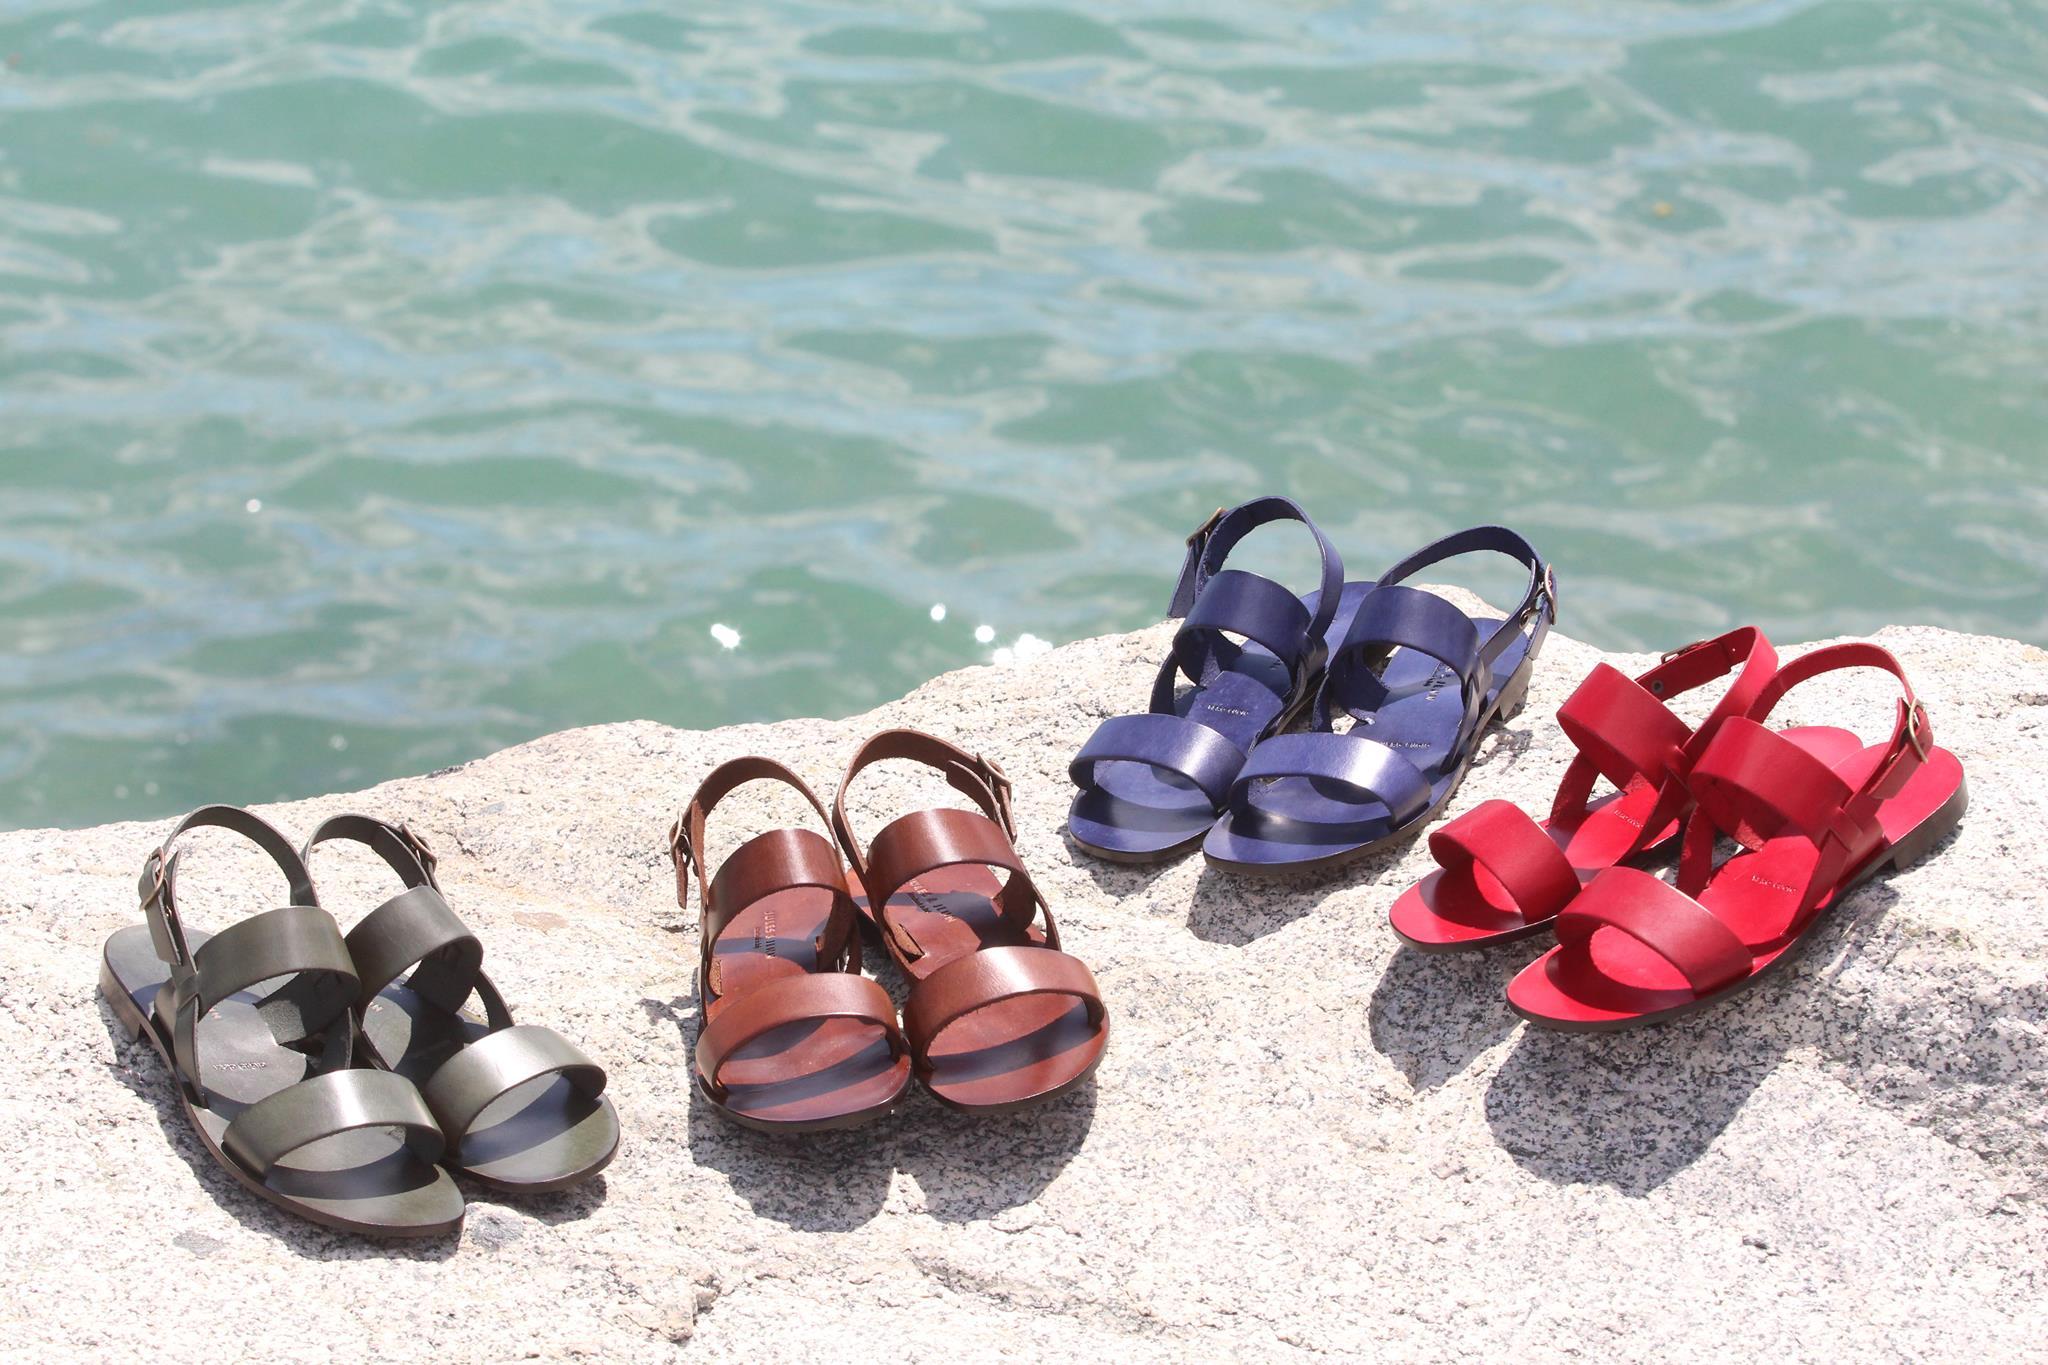 Jules & Jenn les collections chaussures femme sandales plates